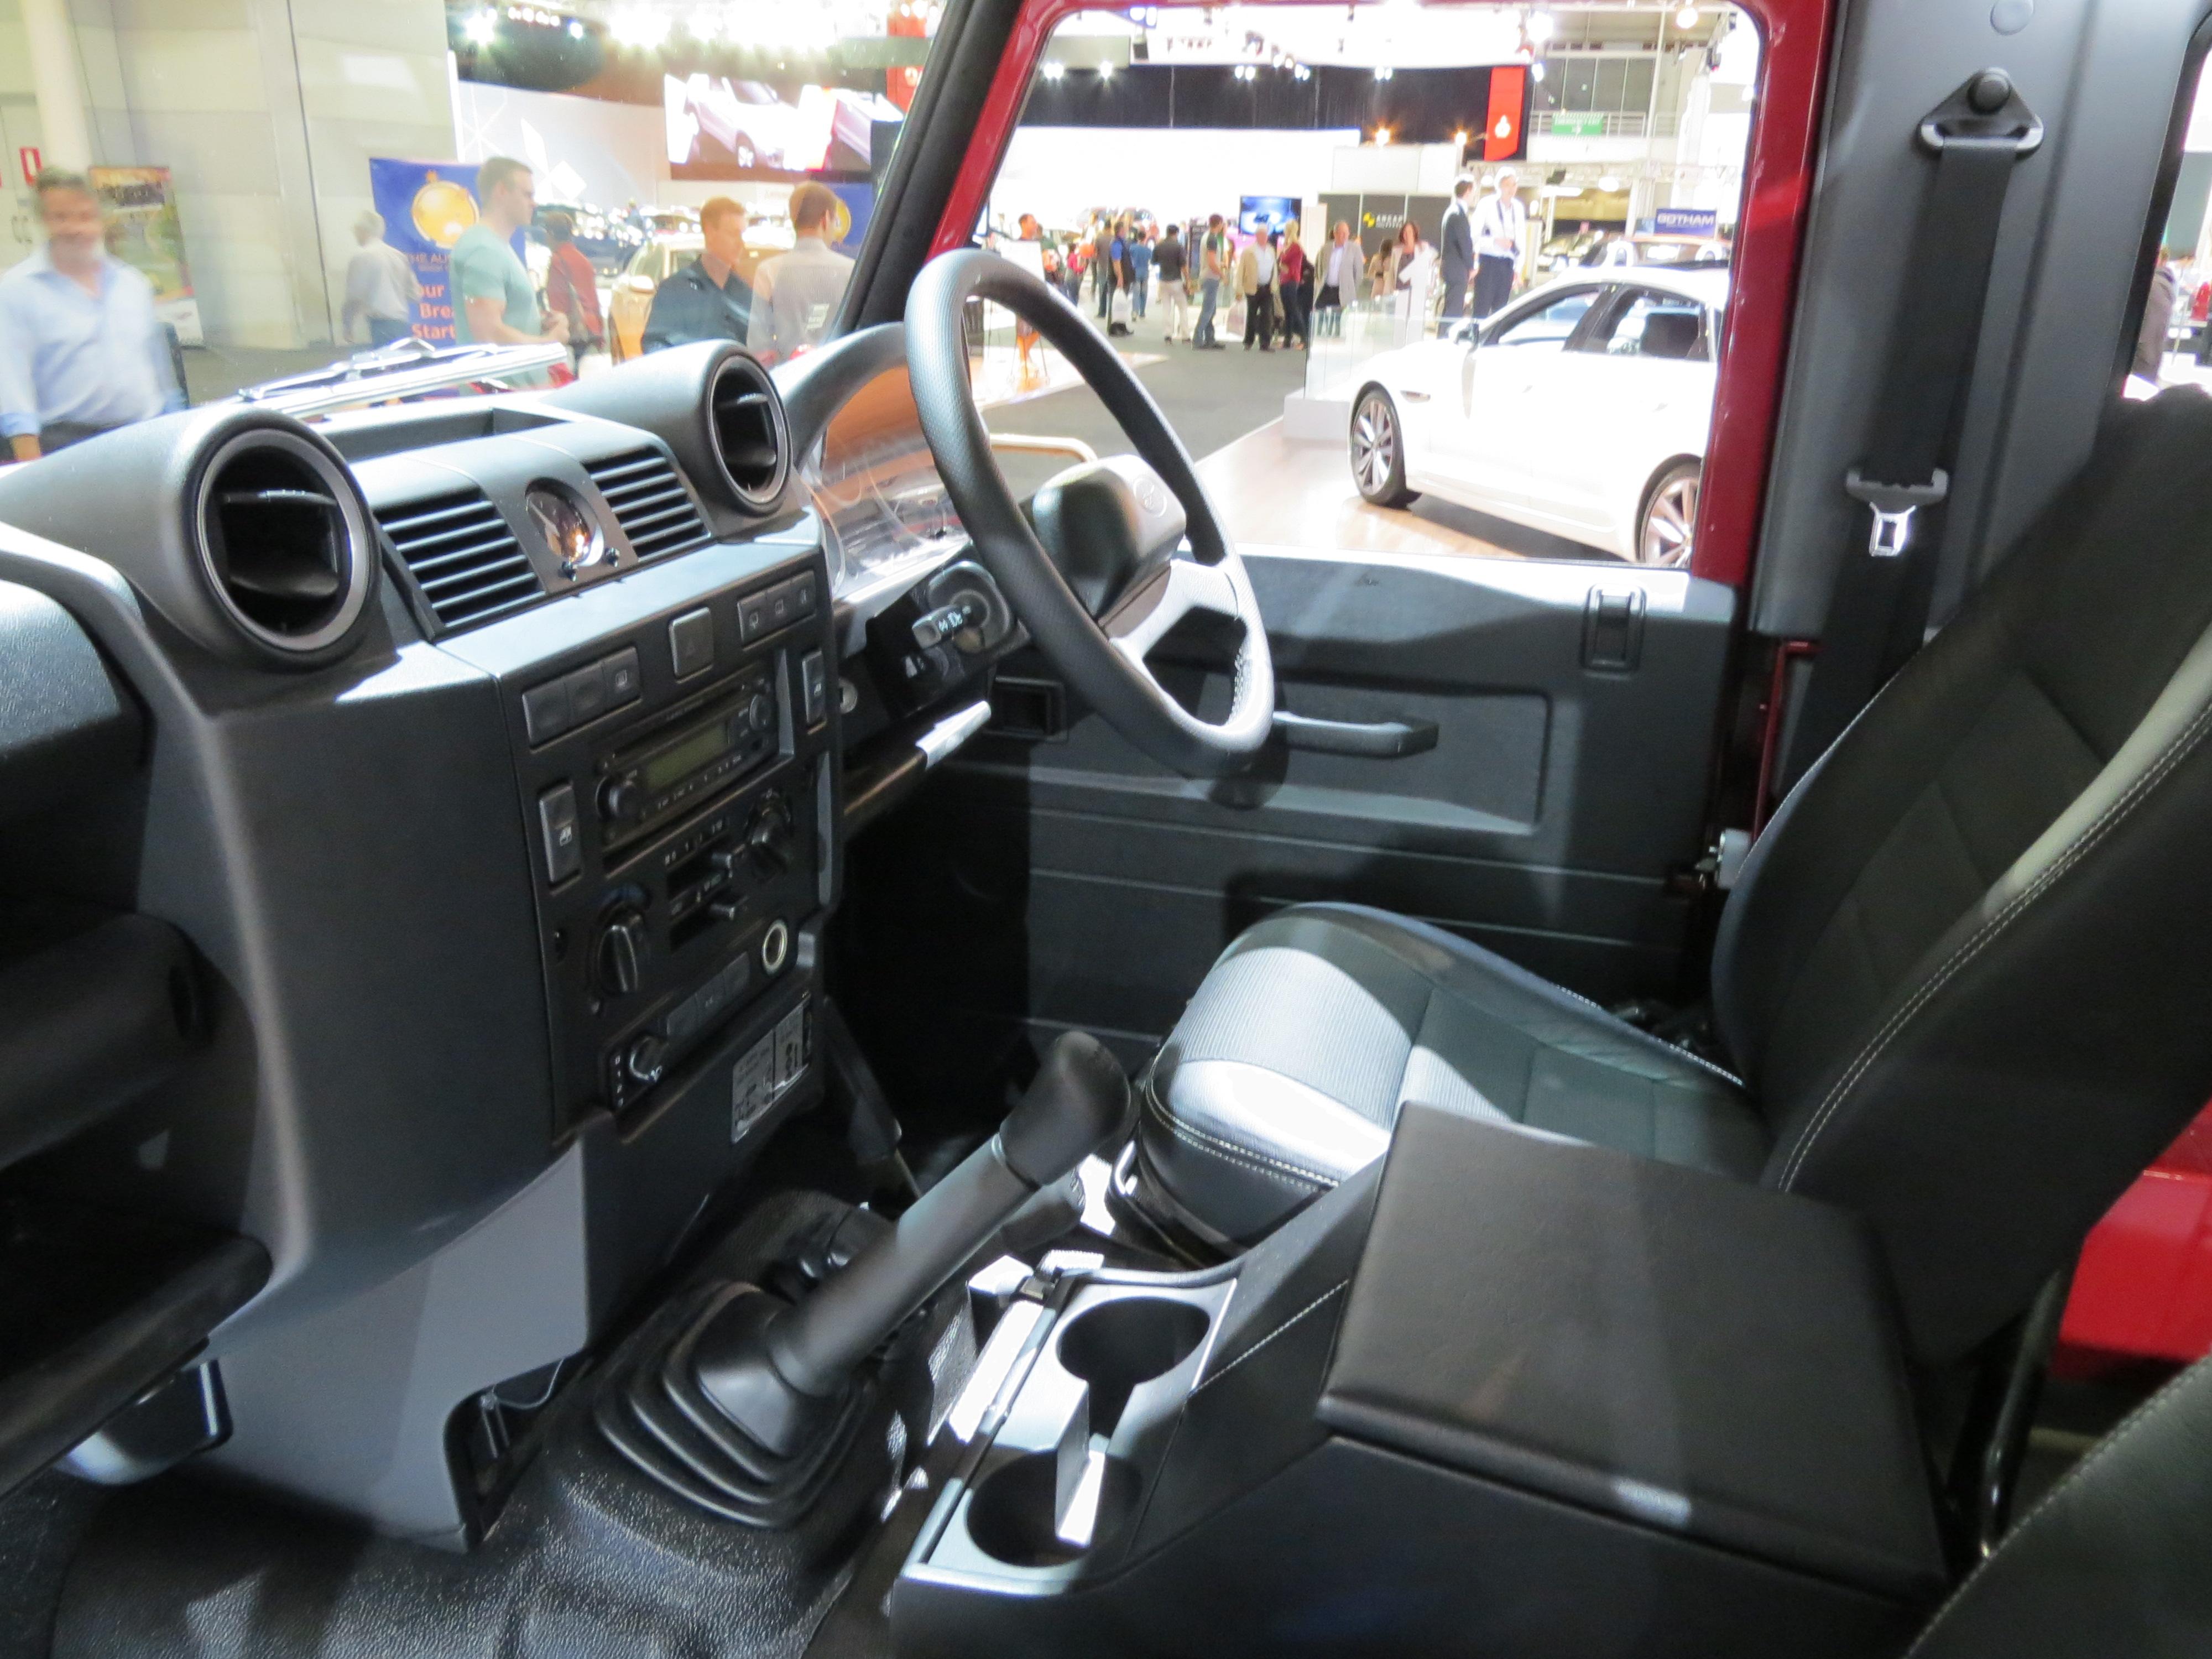 File2012 Land Rover Defender 90 (L316 MY12) 3-door wagon ( & File:2012 Land Rover Defender 90 (L316 MY12) 3-door wagon (2012-10 ...